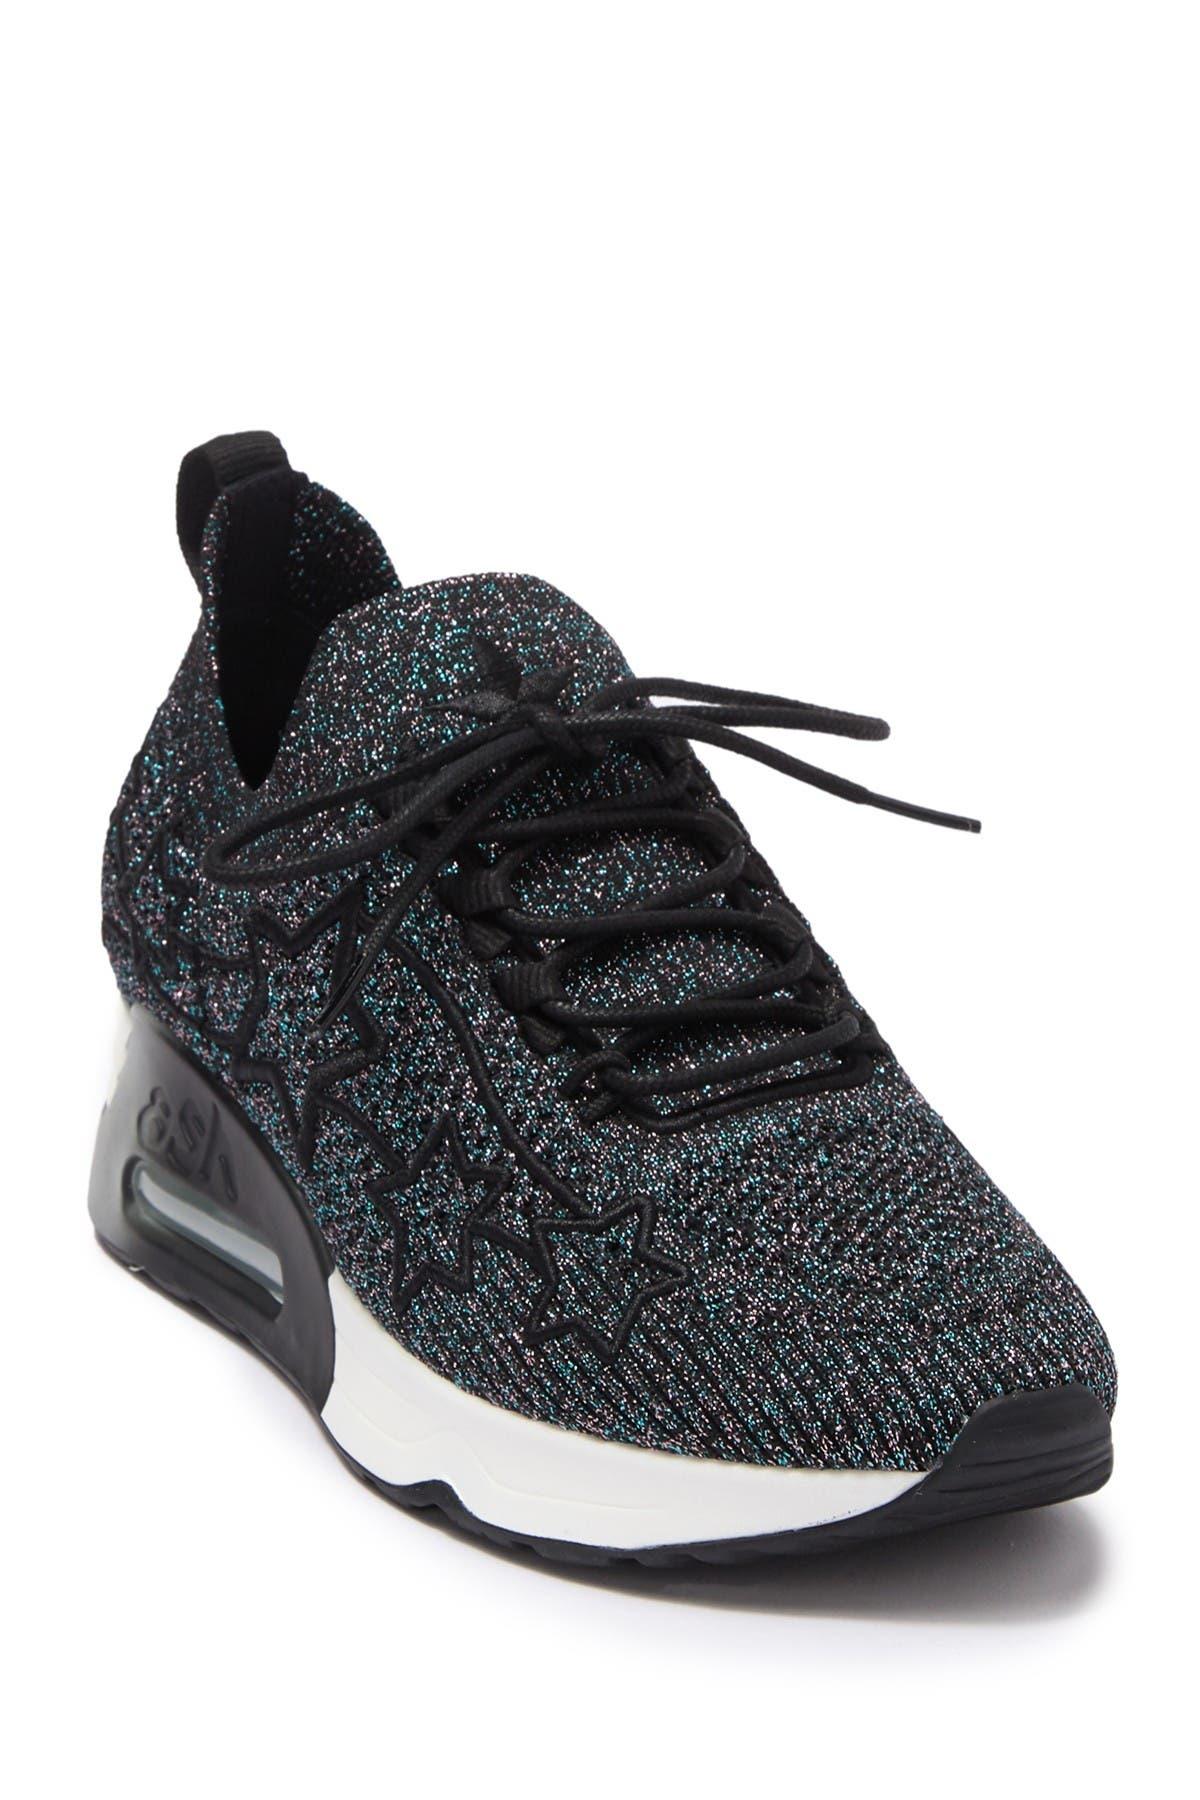 Ash | Lunatic Star Knit Glitter Sneaker